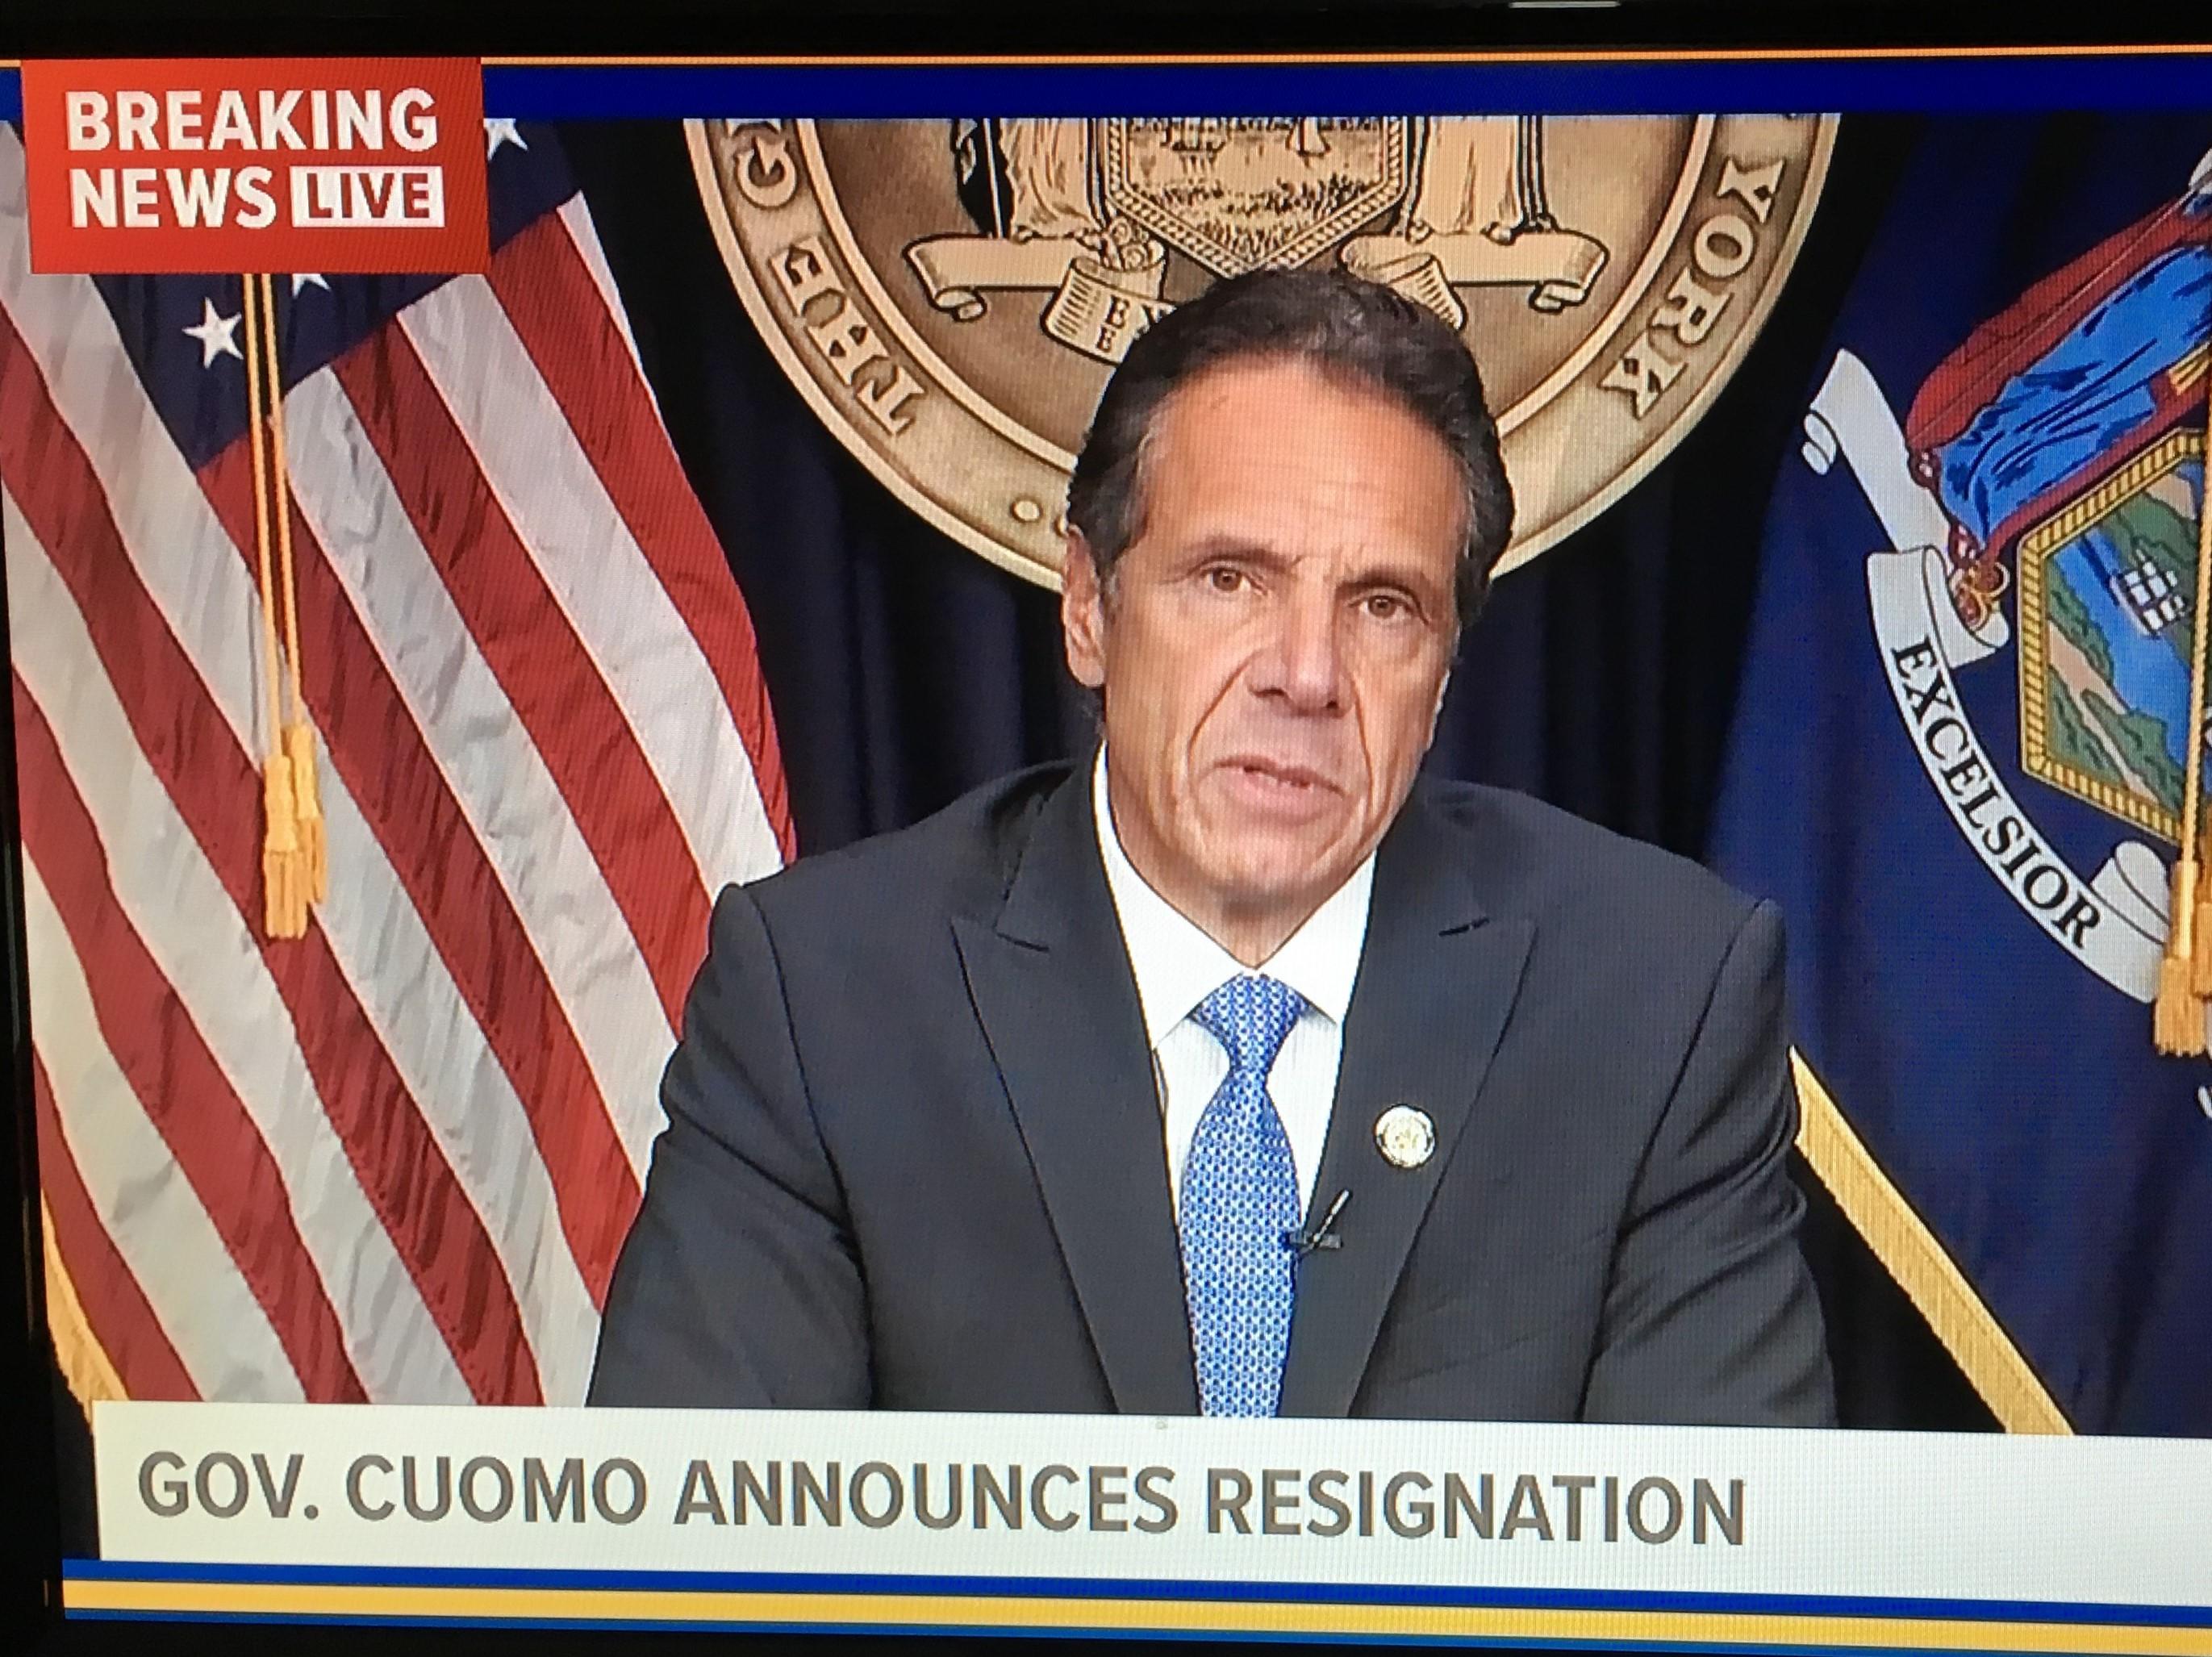 Gov. Cuomo Announces Resignation 08-10-2021